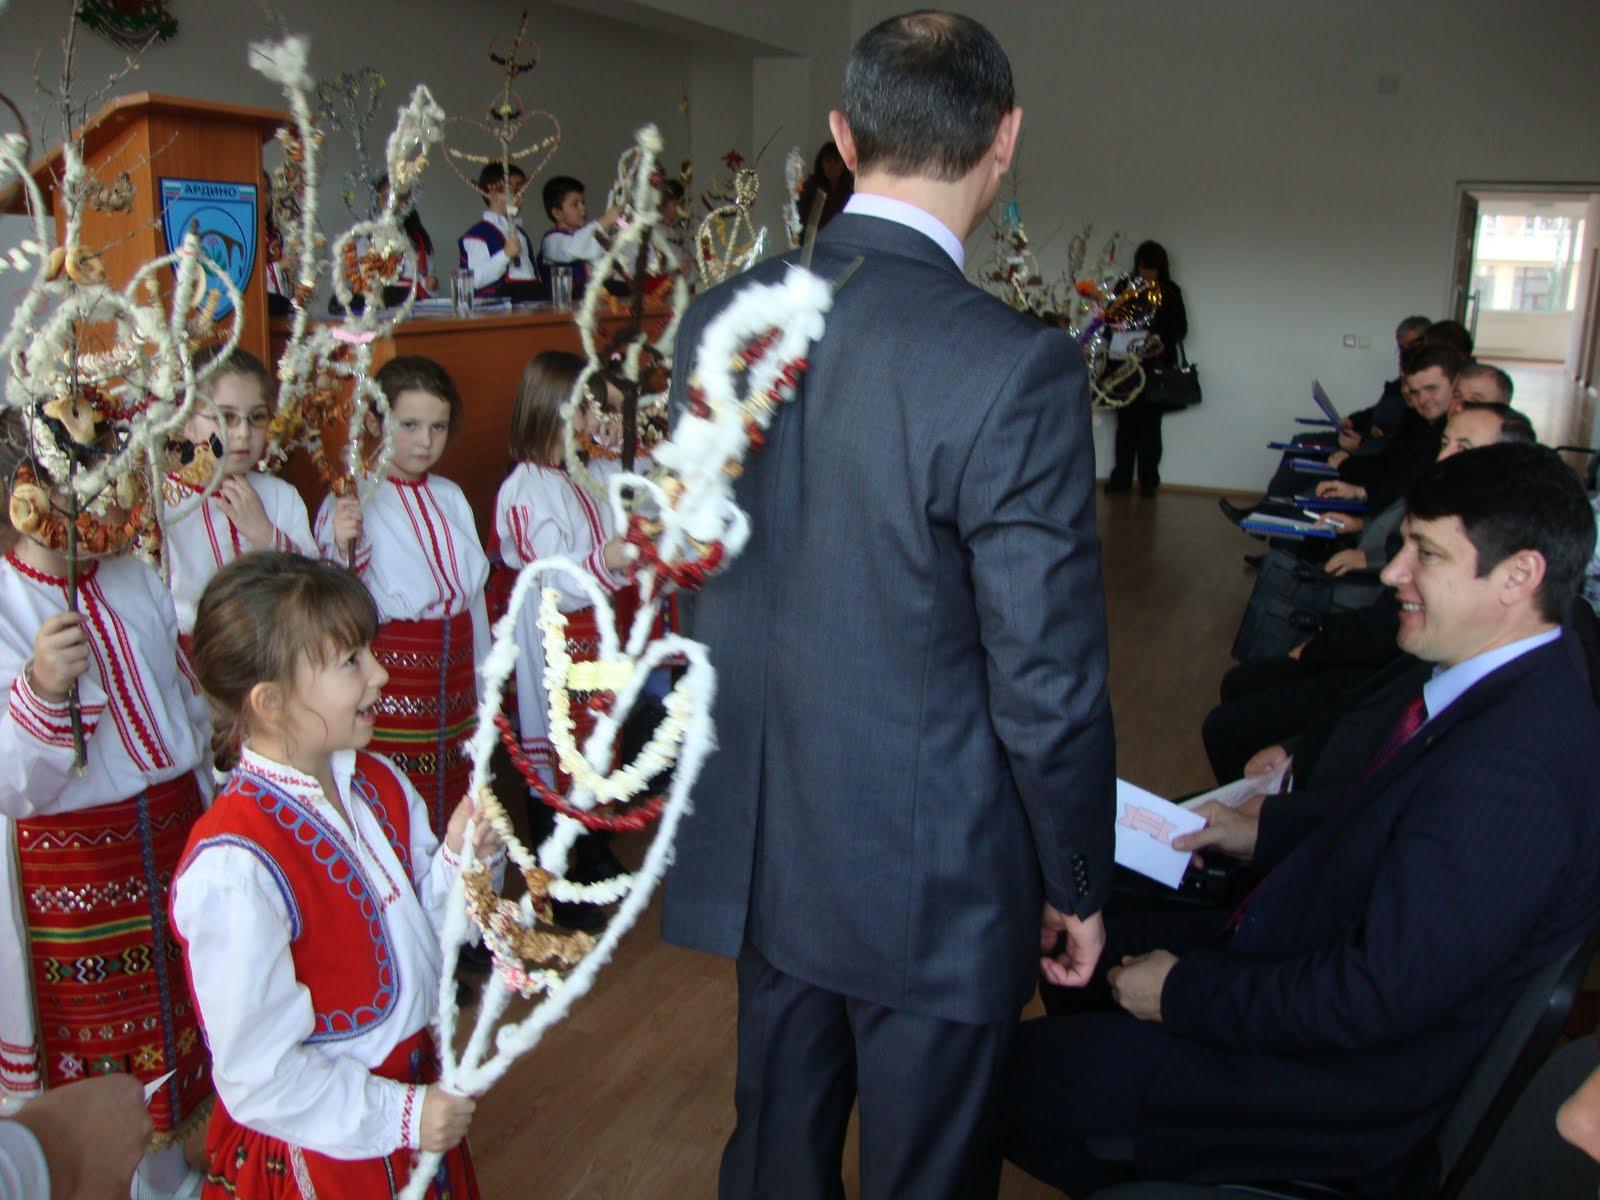 Surva Surva Godina, Vesela Godina kid back tapping an older man Bulgaria